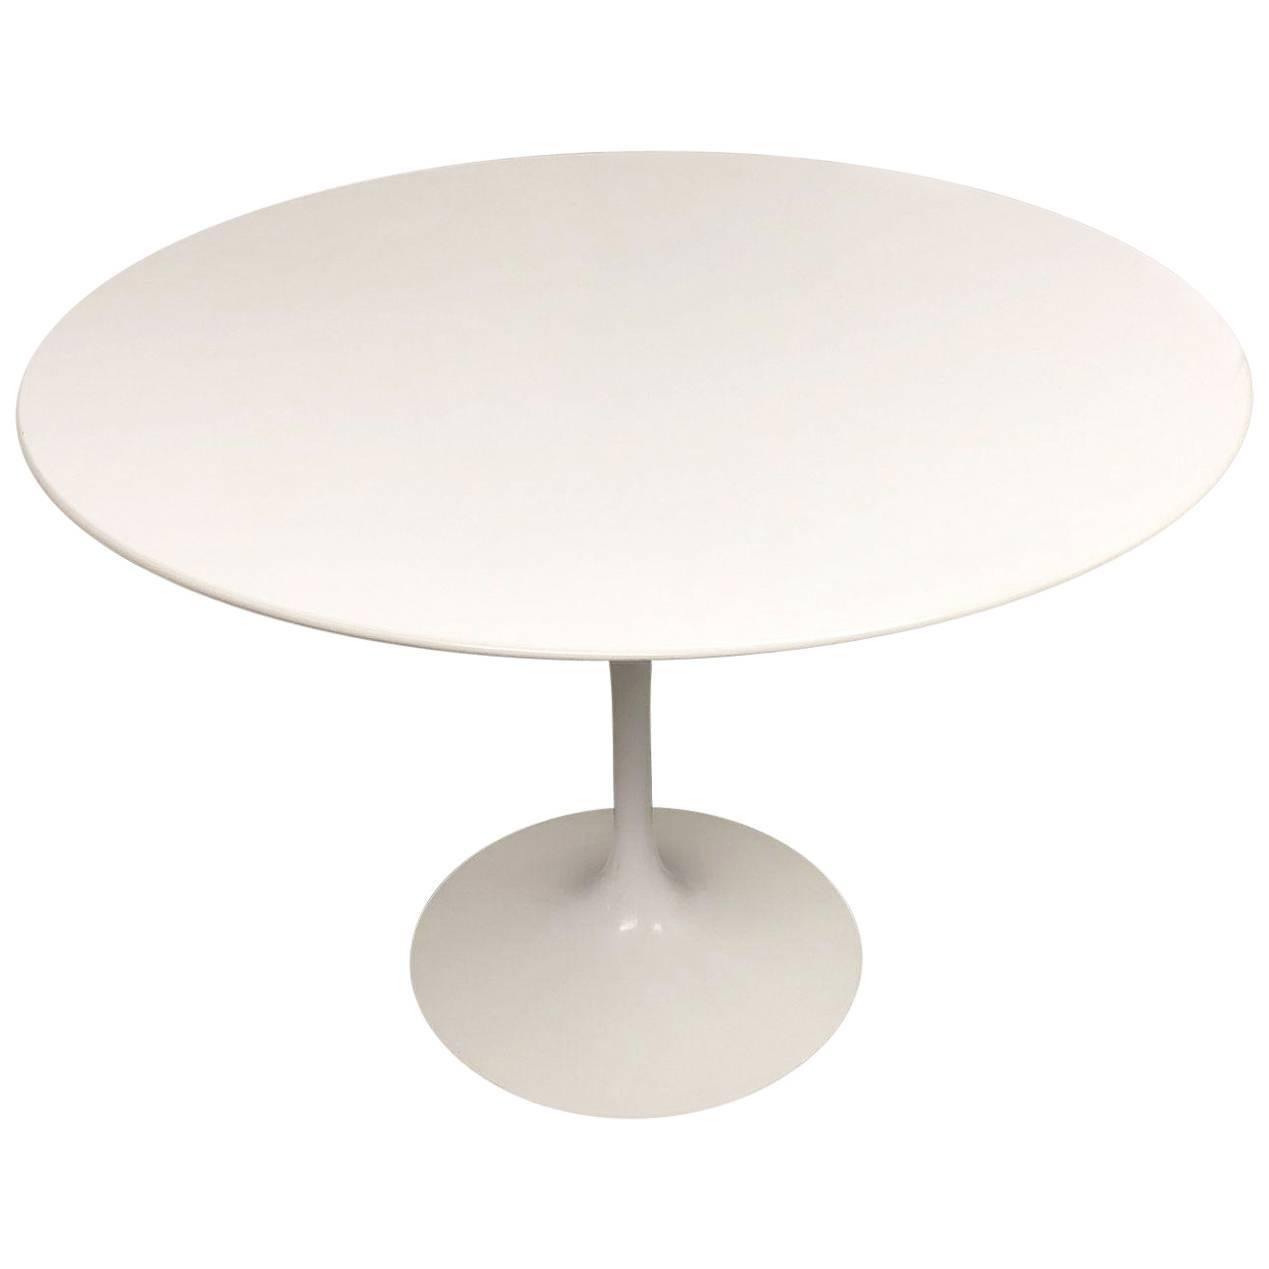 Knoll Eero Saarinen Round Dining Table For Sale